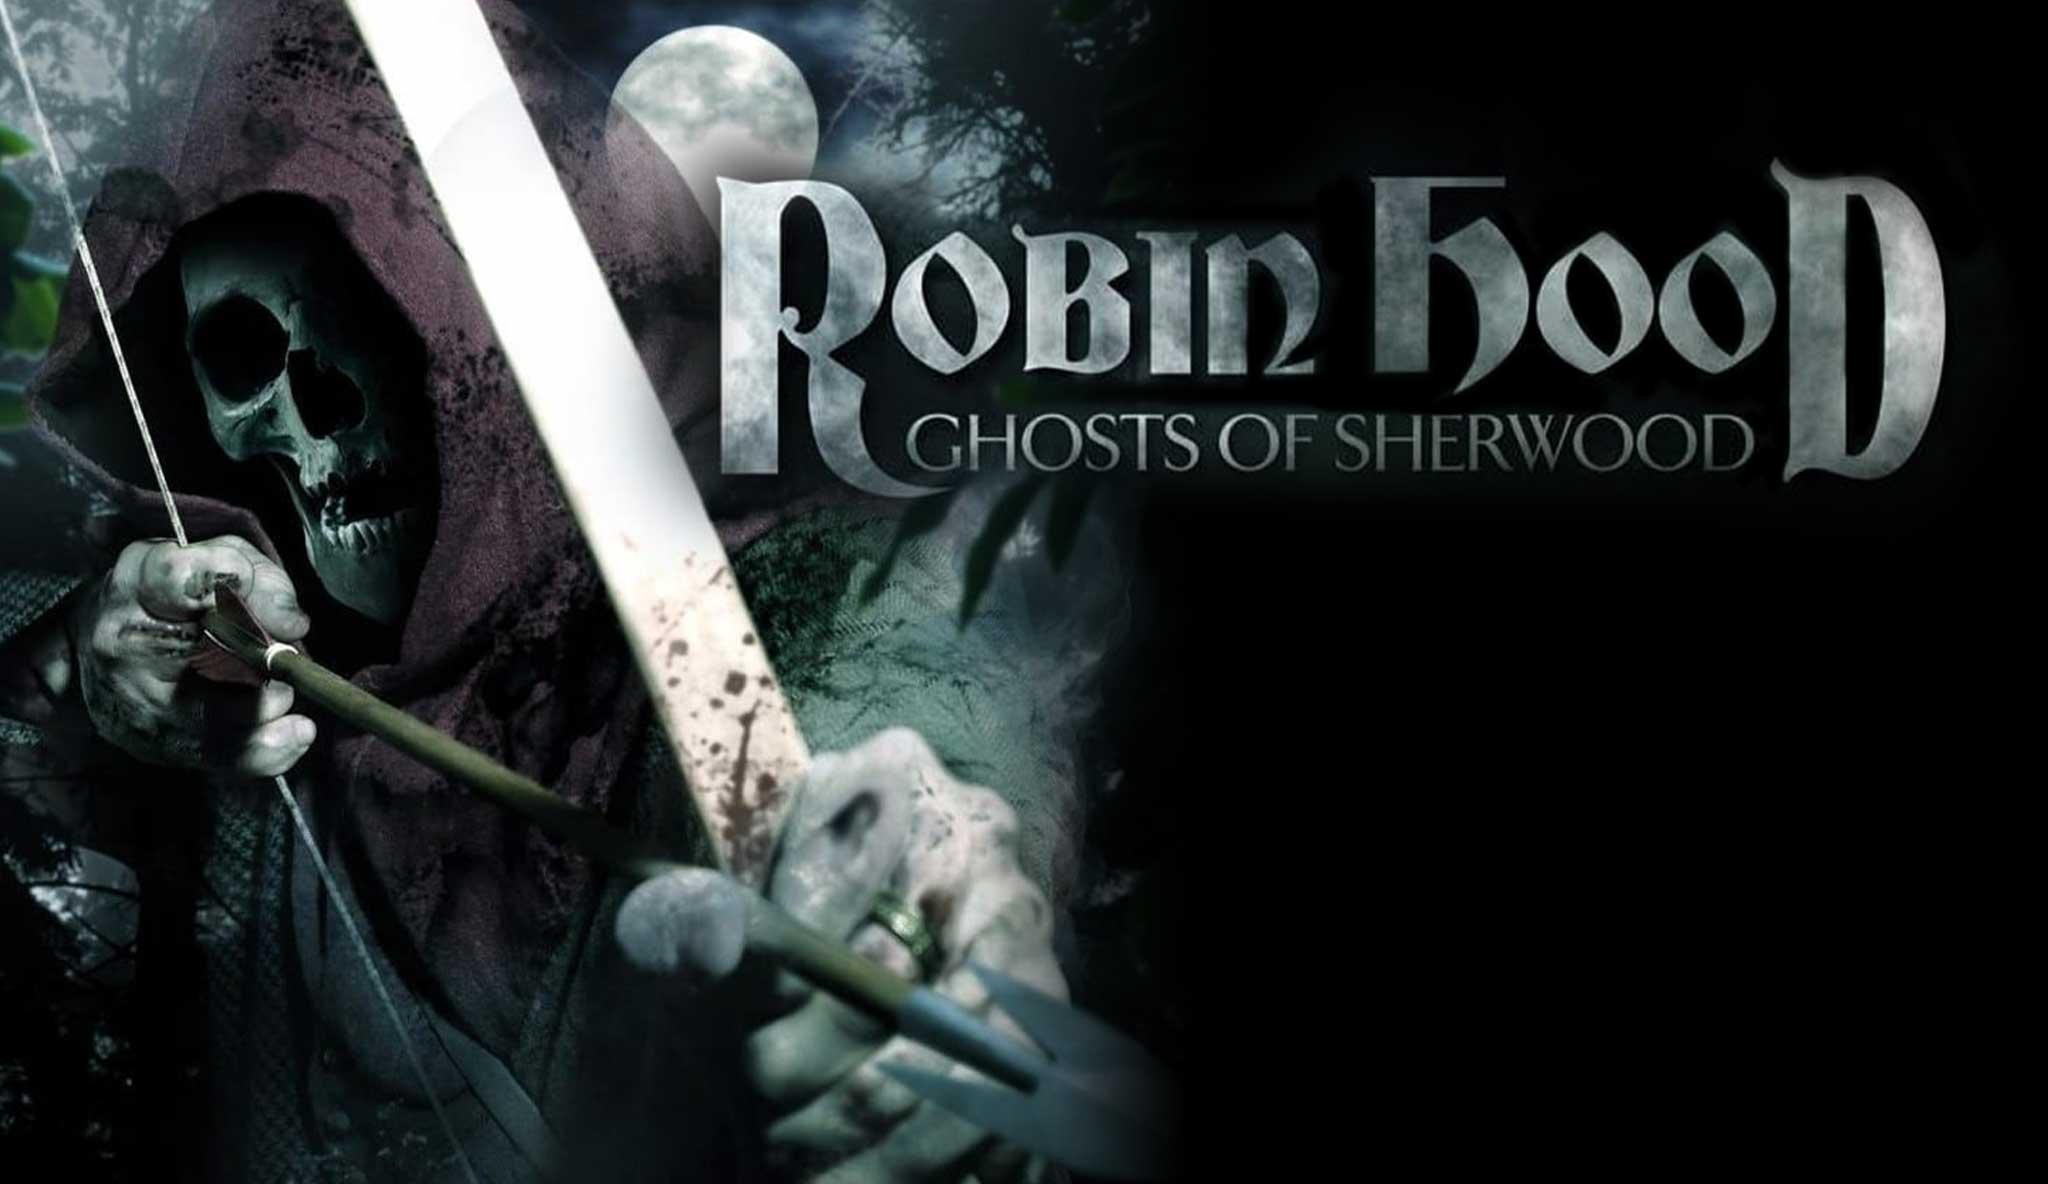 robin-hood-ghosts-of-sherwood\header.jpg